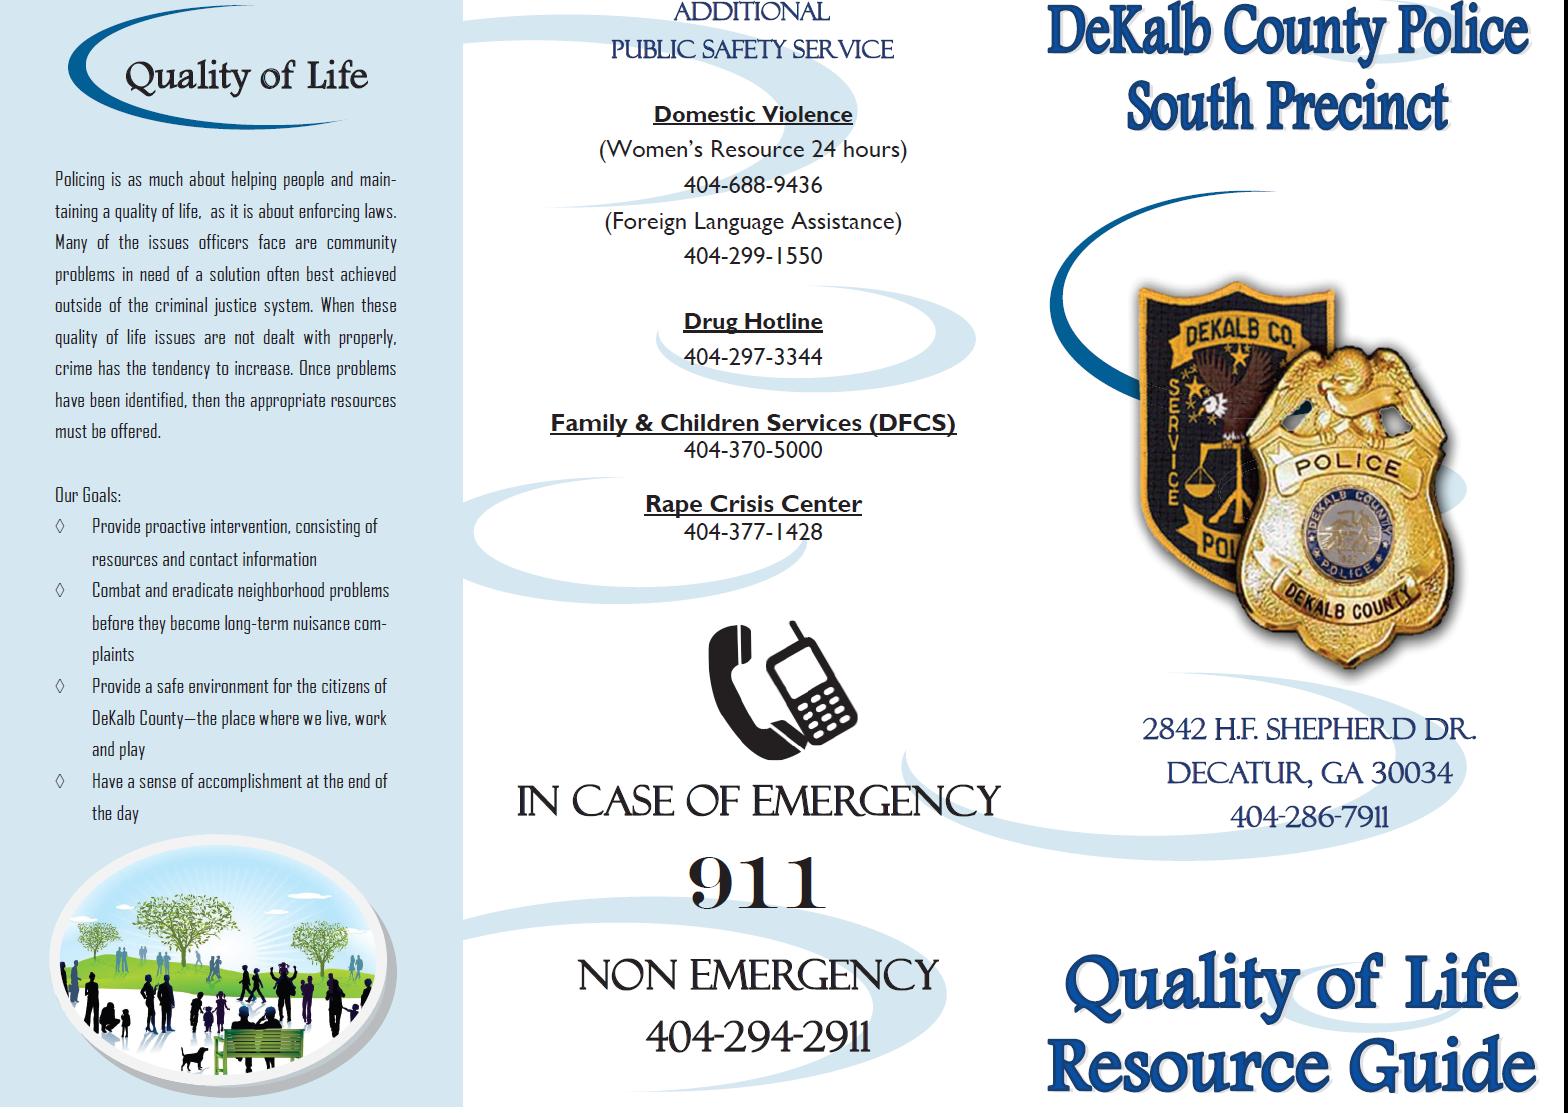 Quality of Life (DeKalb County Police Department) &mdash